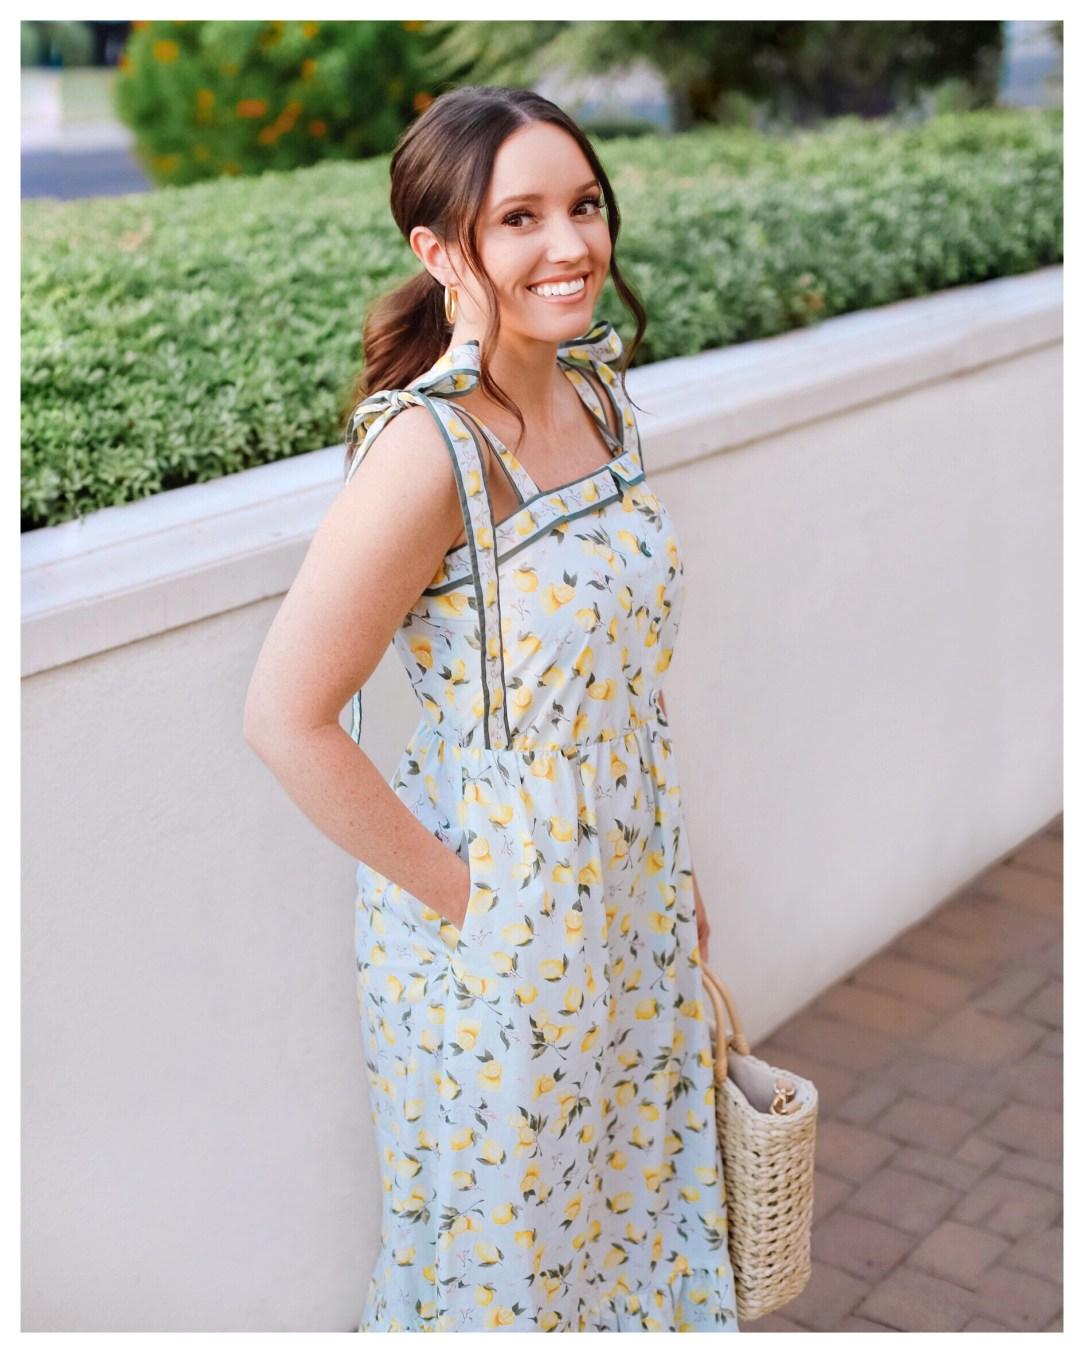 Lemon Print Dress on Five Foot Feminine